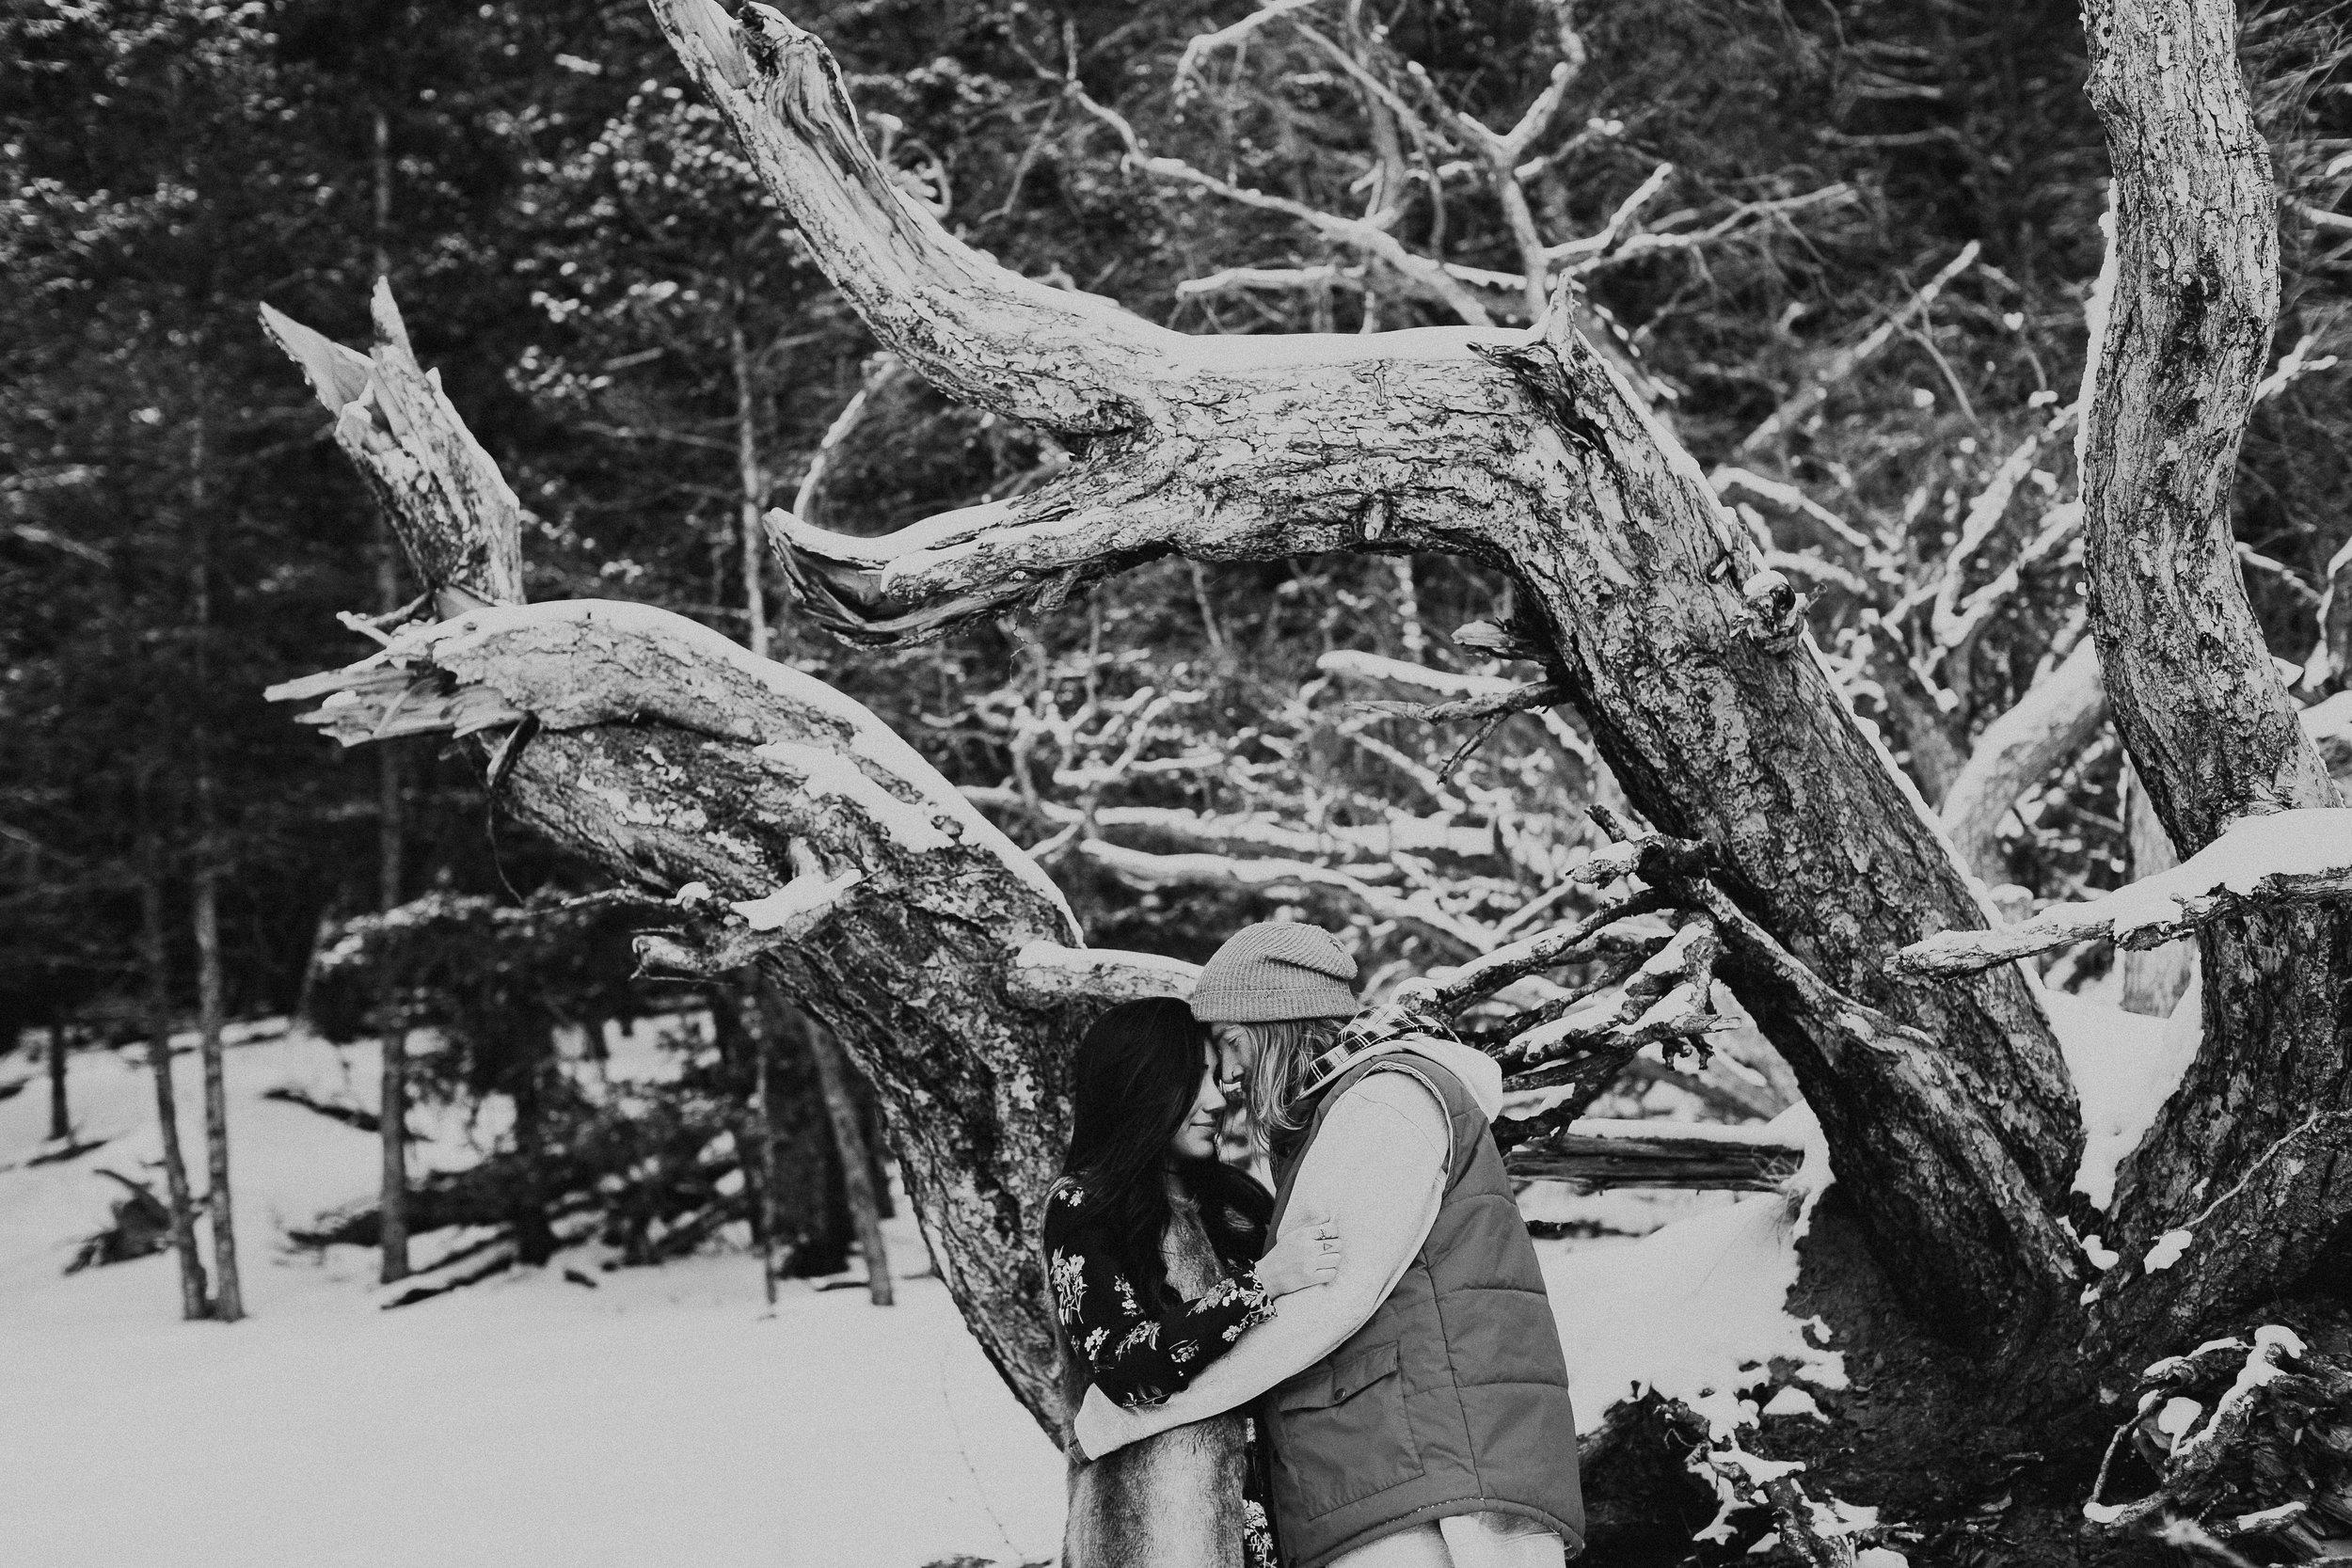 Banff Engagement Photographer - Winter Mountain Adventure Engagement Session - Michelle Larmand Photography-076